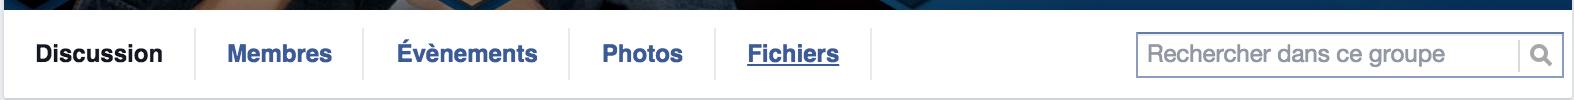 groupe facebook recherche